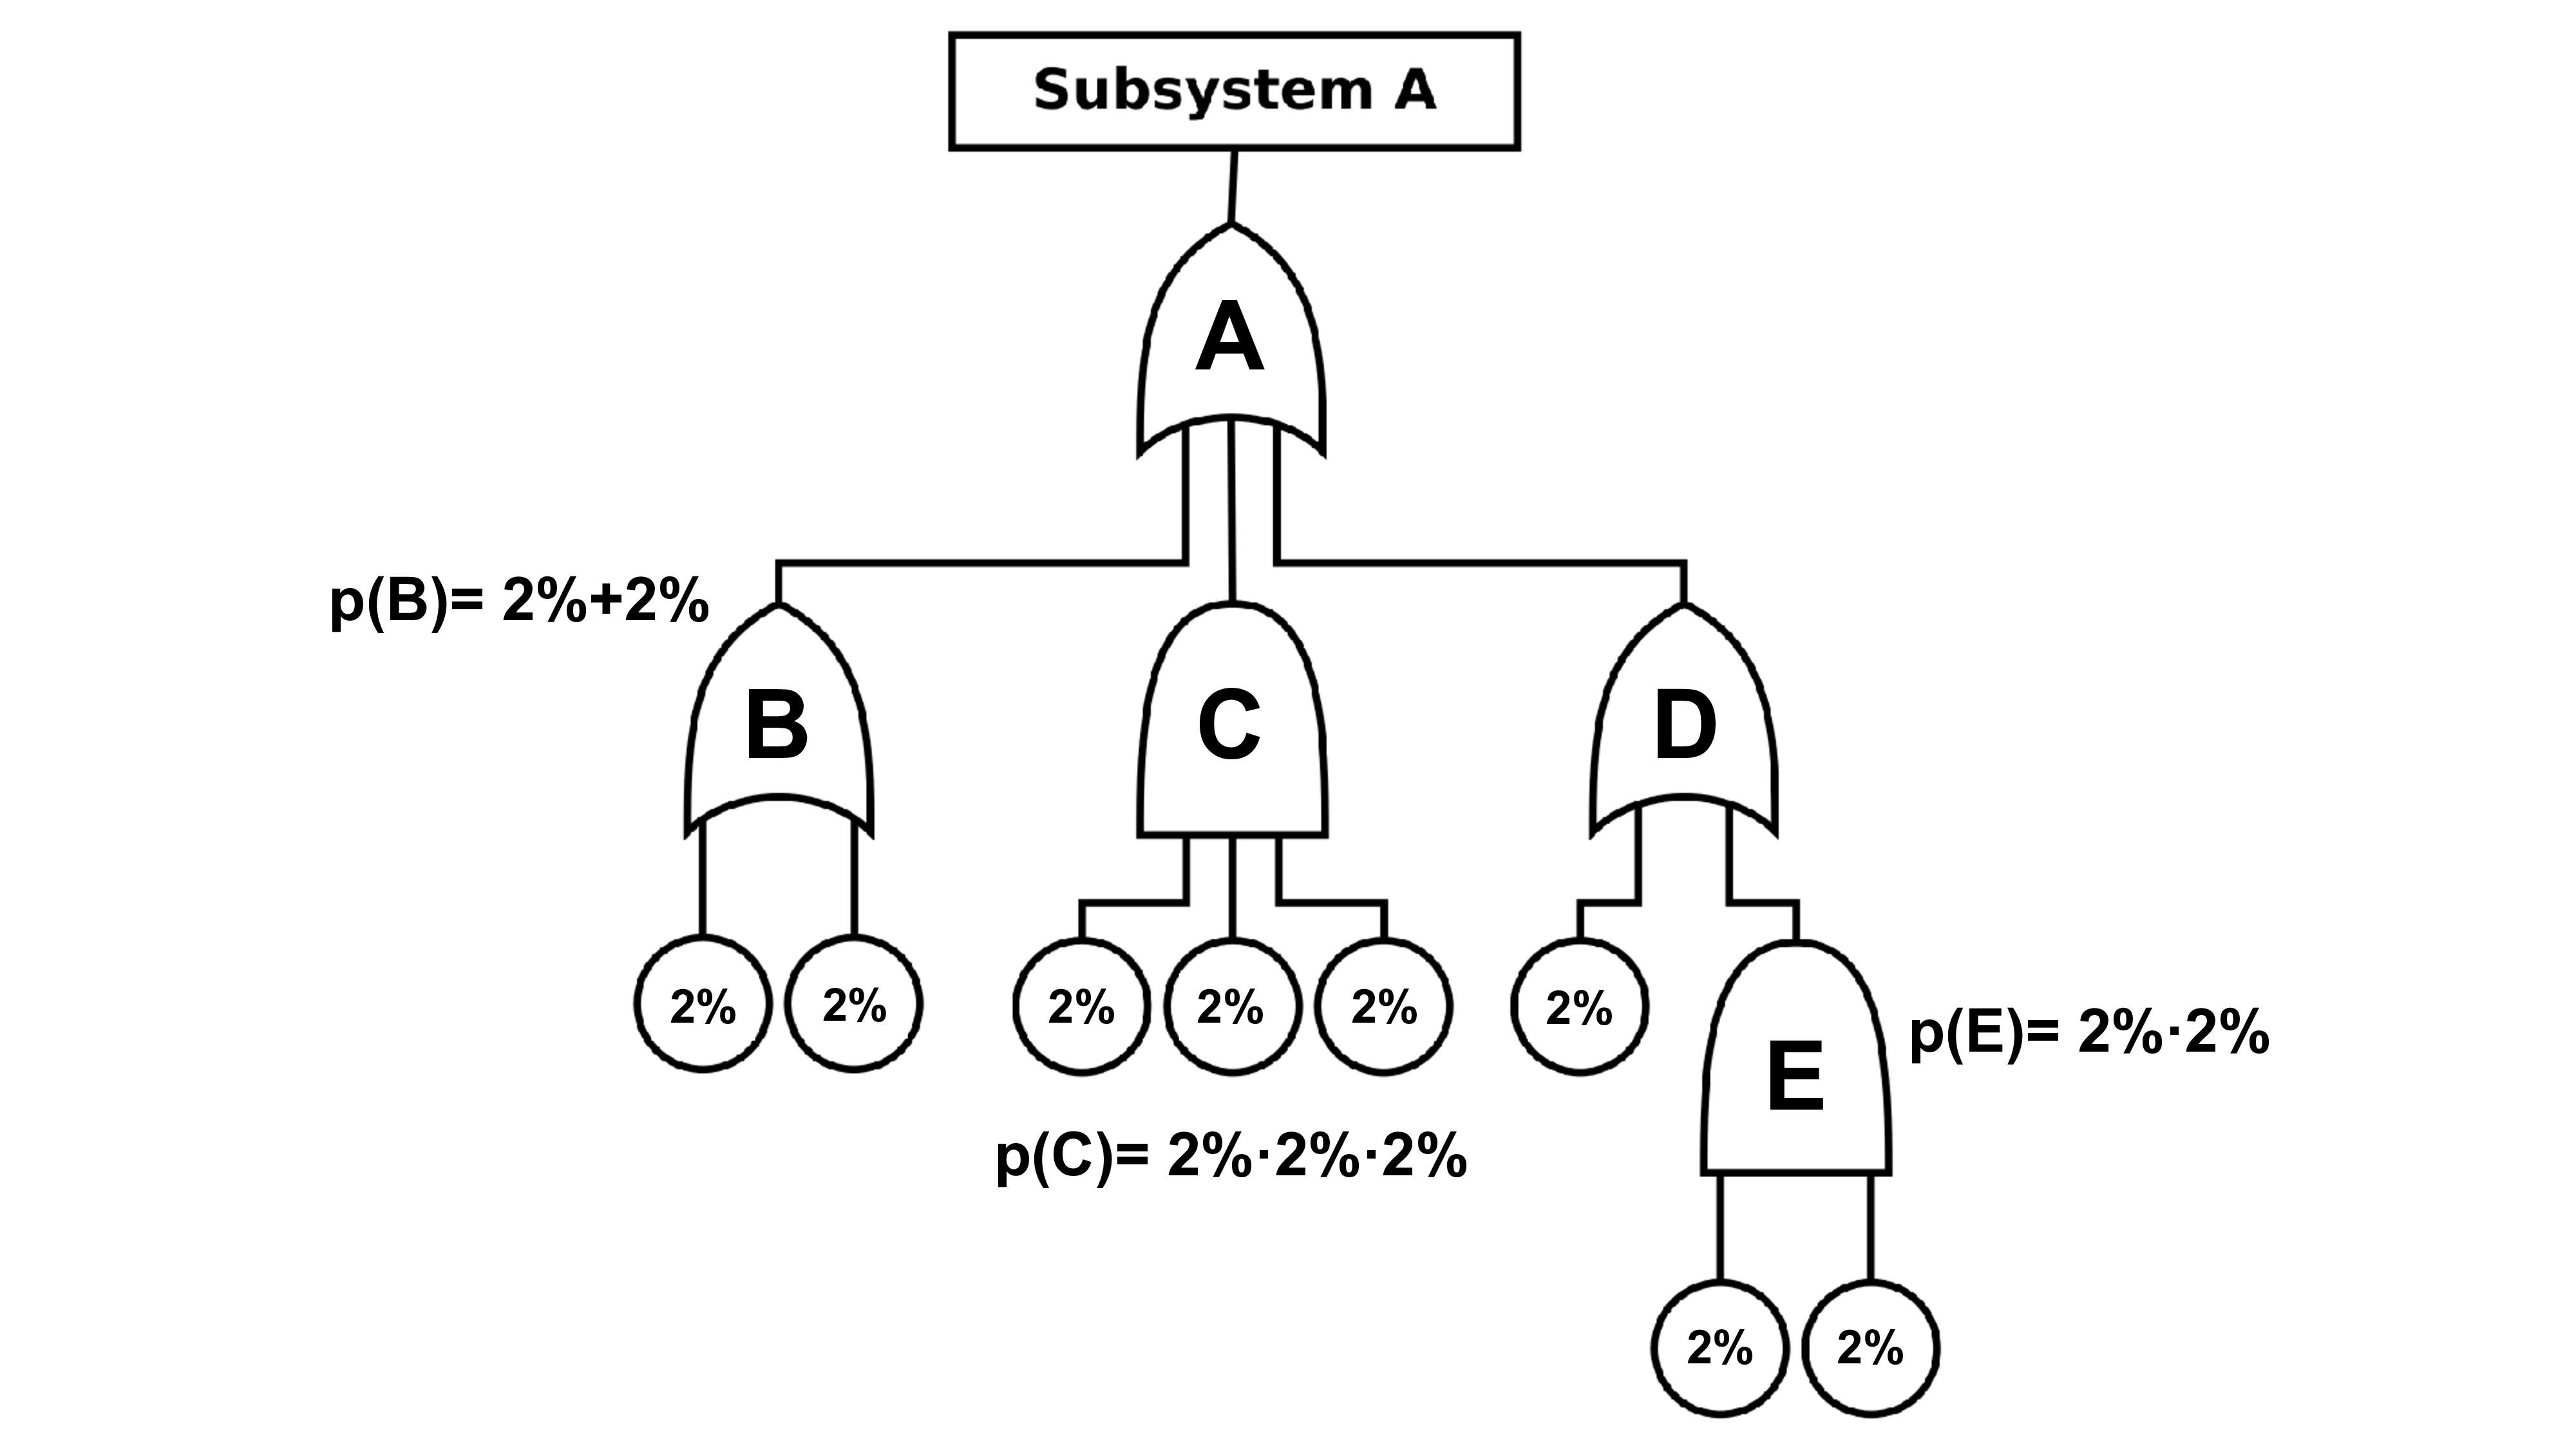 A B C D E p(E)= 2%·2% 2% 2% 2% 2% 2% 2% 2% 2% p...